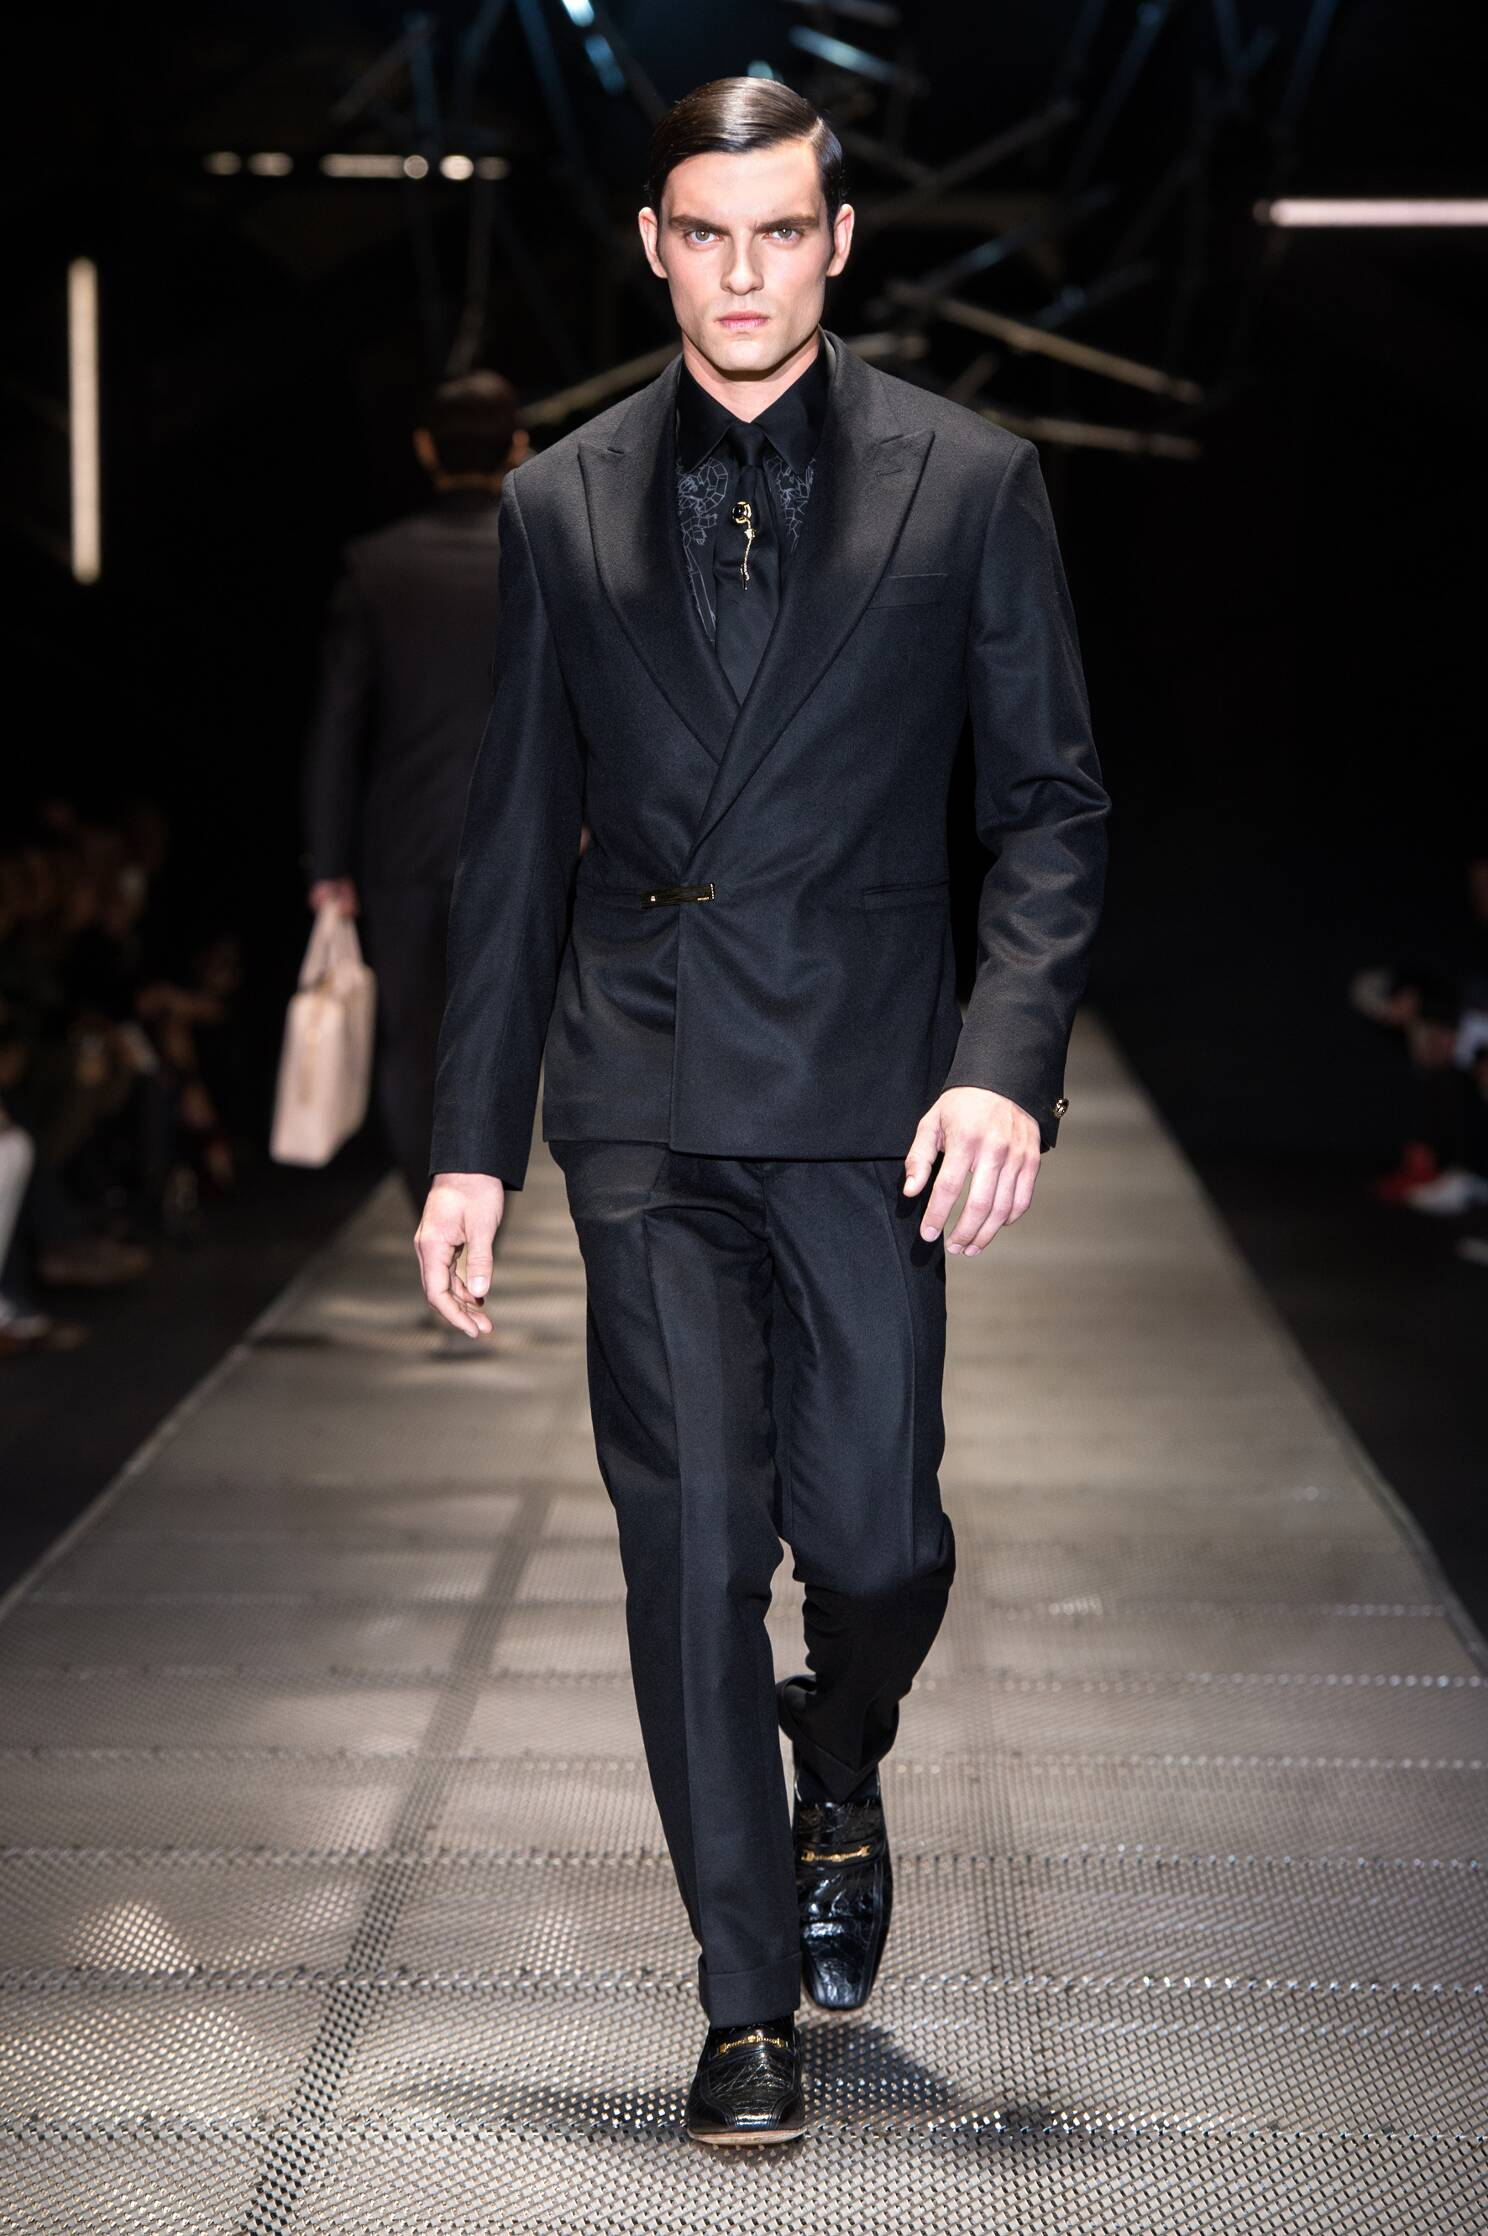 Versace Fall Winter 2015 16 Men's Collection Milan Fashion Week Fashion Show